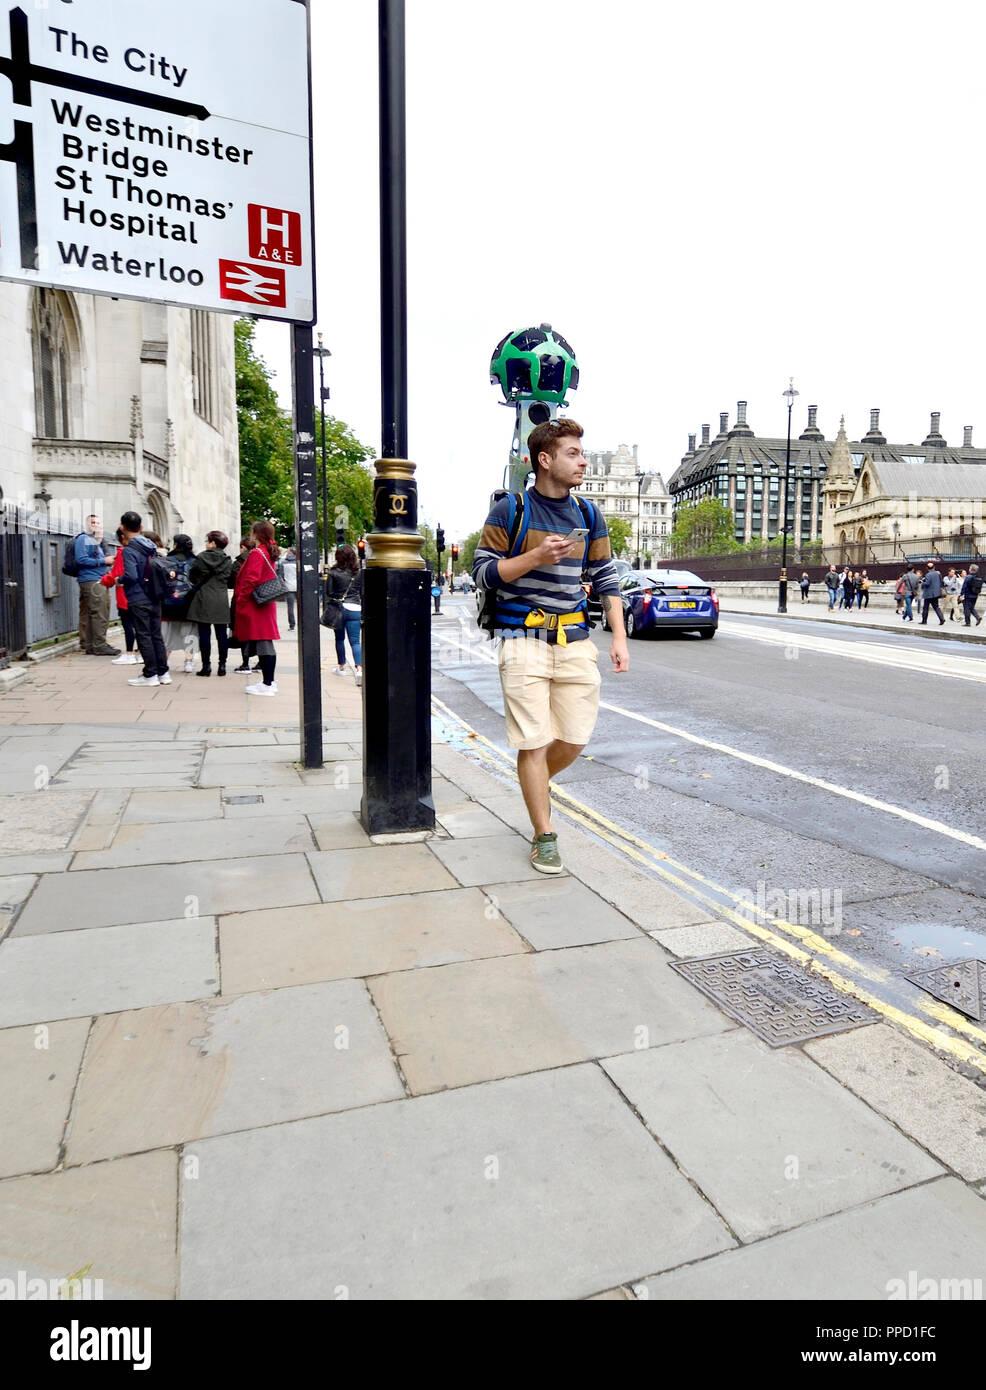 Man in Westminster with Google Trekker 360 degree panoramic camera. London, England, UK. - Stock Image